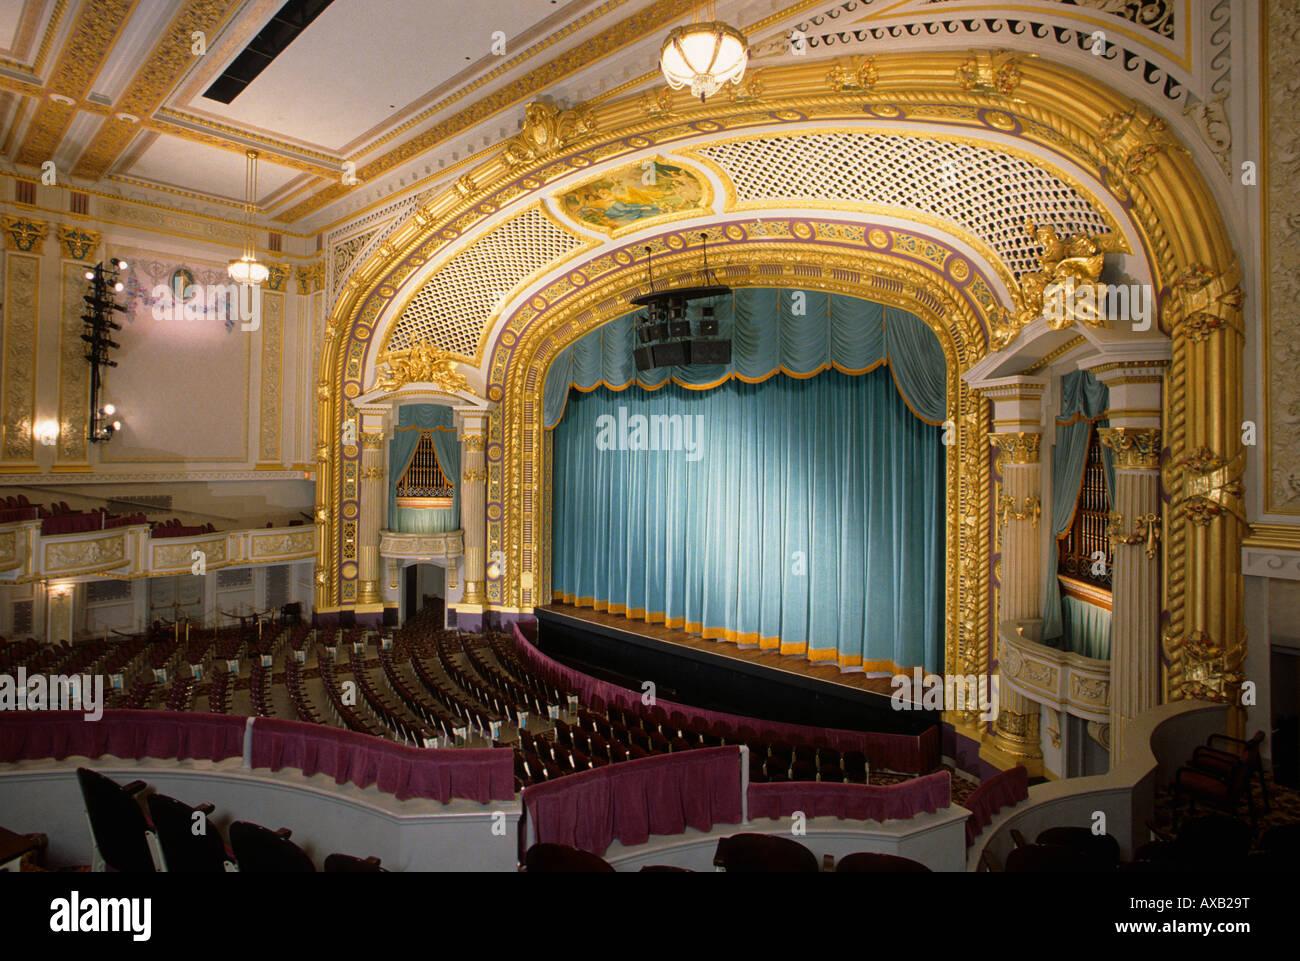 Movie theatre mpls